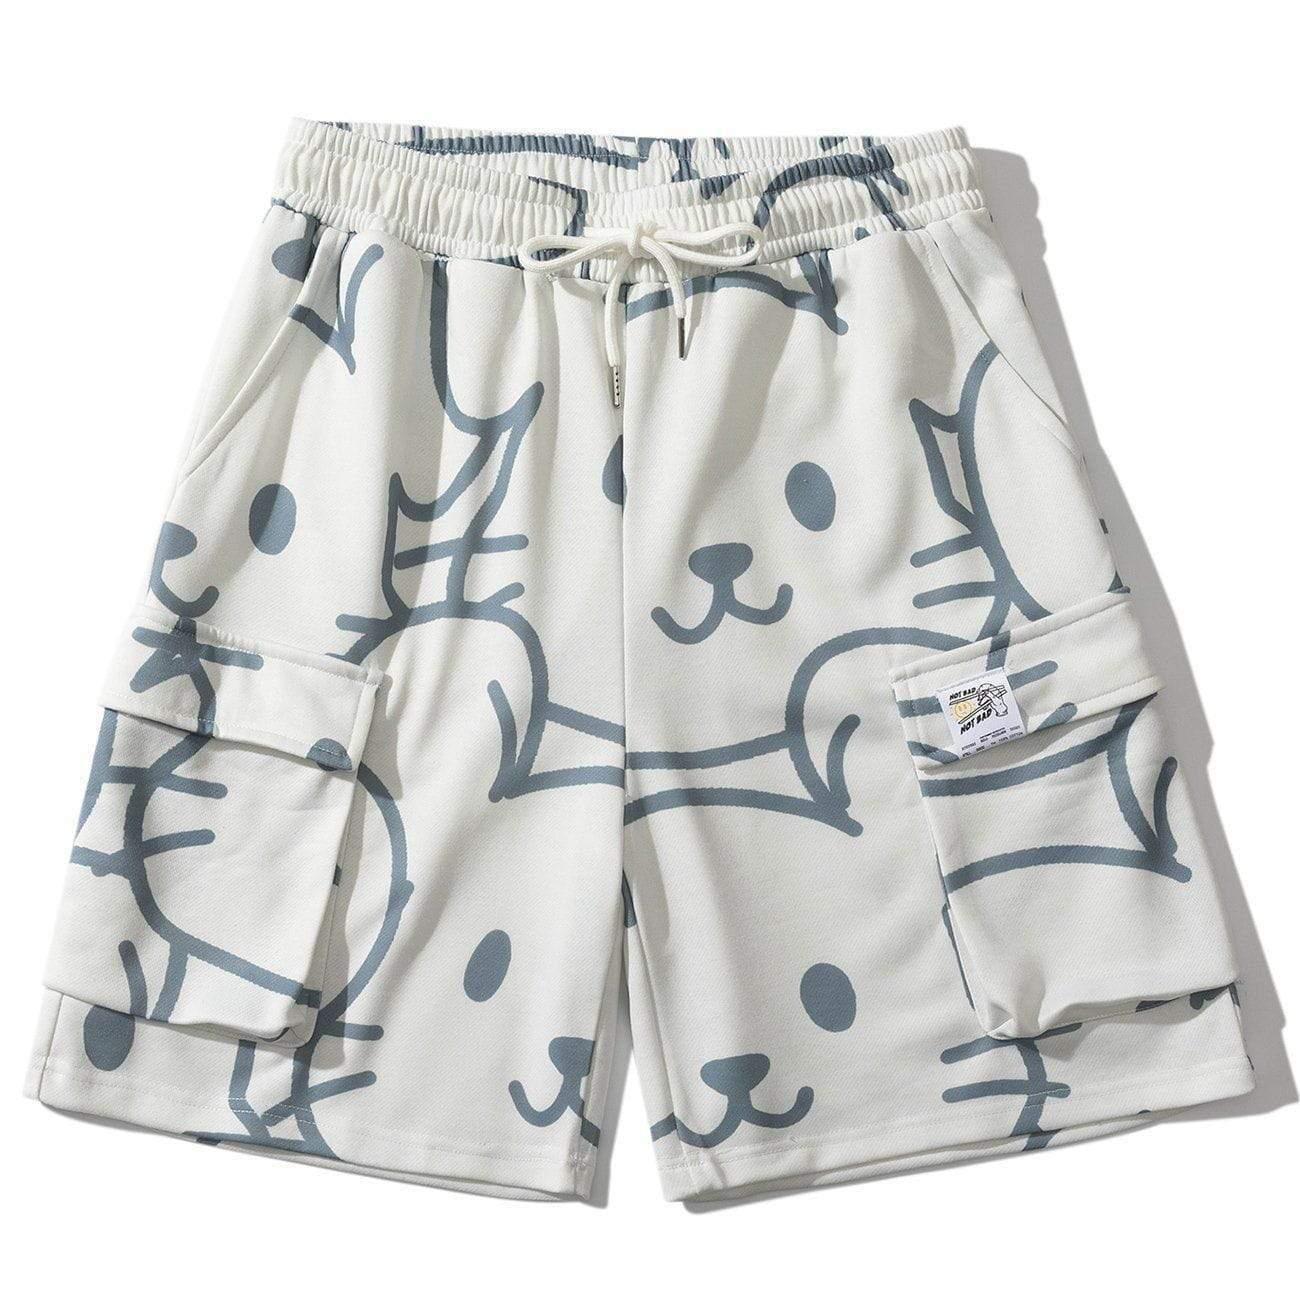 2021 Summer Mouse Pantaloncini pieni di stampa uomo Hip hop streetwear graffiti ricamato pantaloni corti ricamati Harajuku sfumato joggers sweatshorts